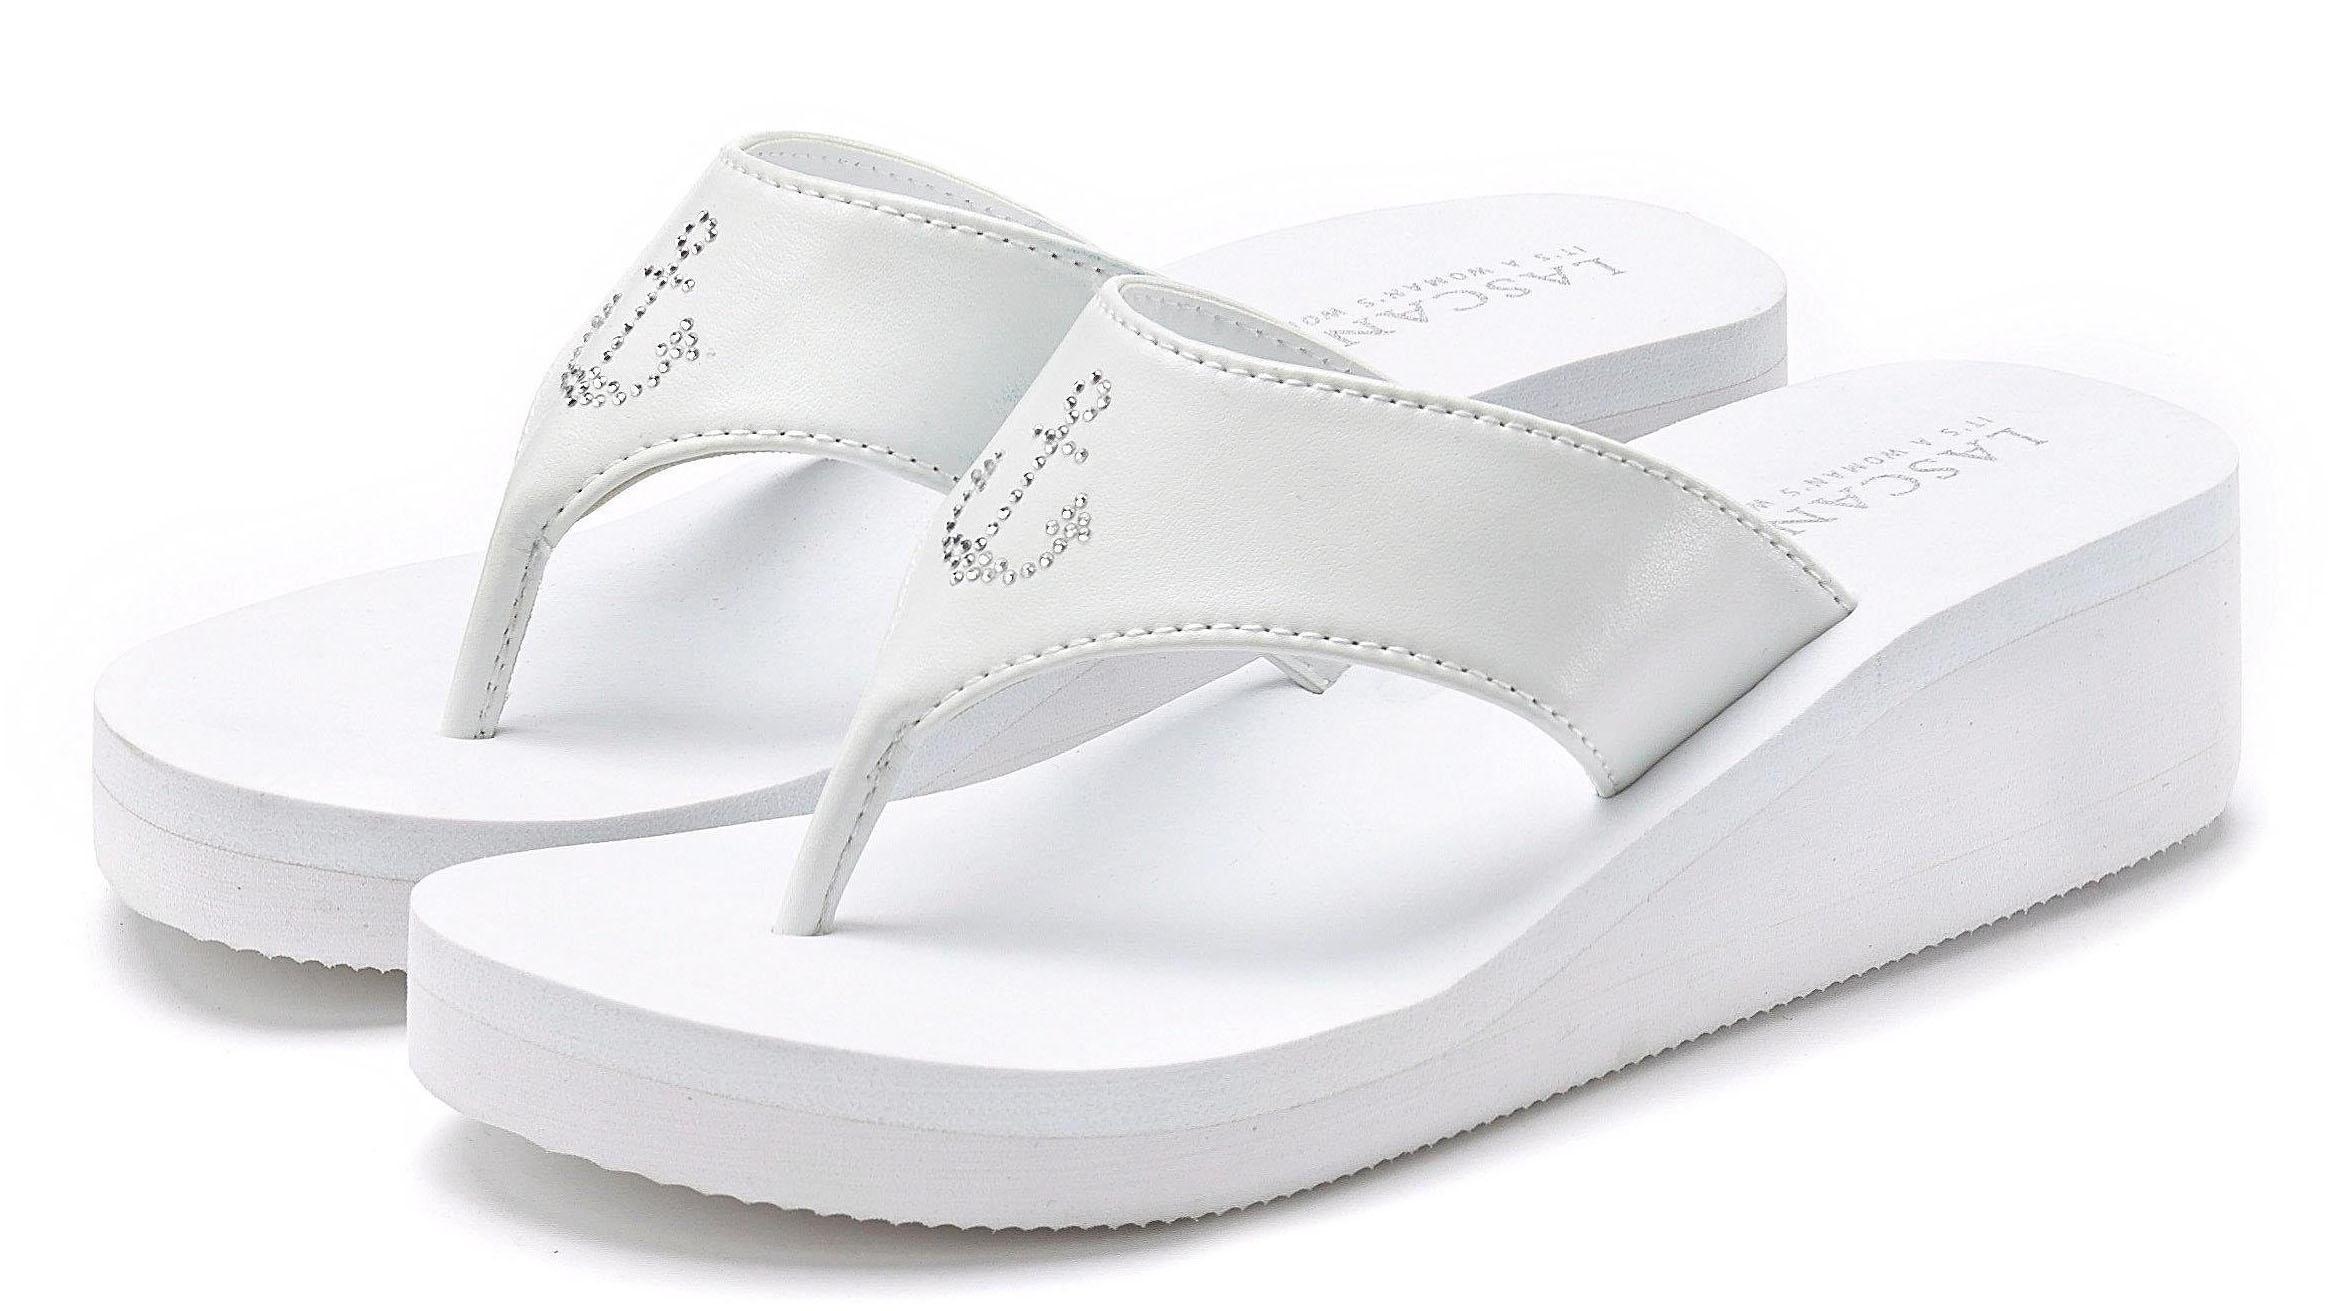 LASCANA Zehentrenner | Schuhe > Sandalen & Zehentrenner > Zehentrenner | Lascana